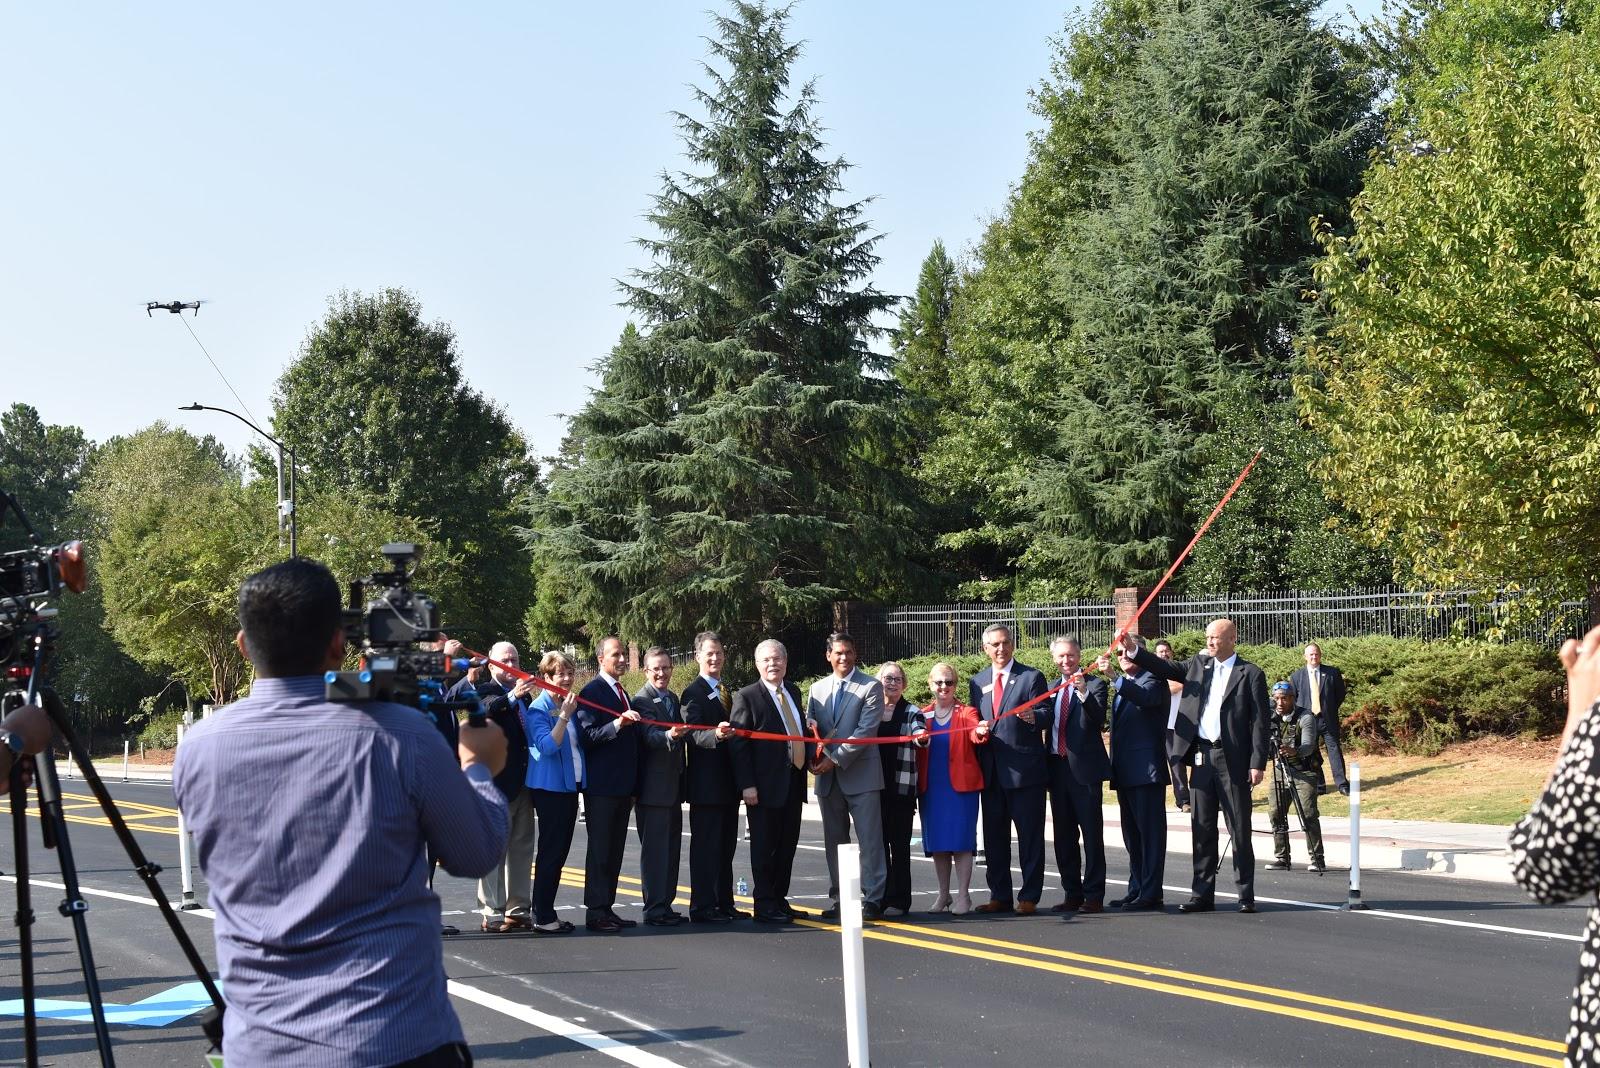 America's First 5G-Powered Smart City, Peachtree Corners Georgia